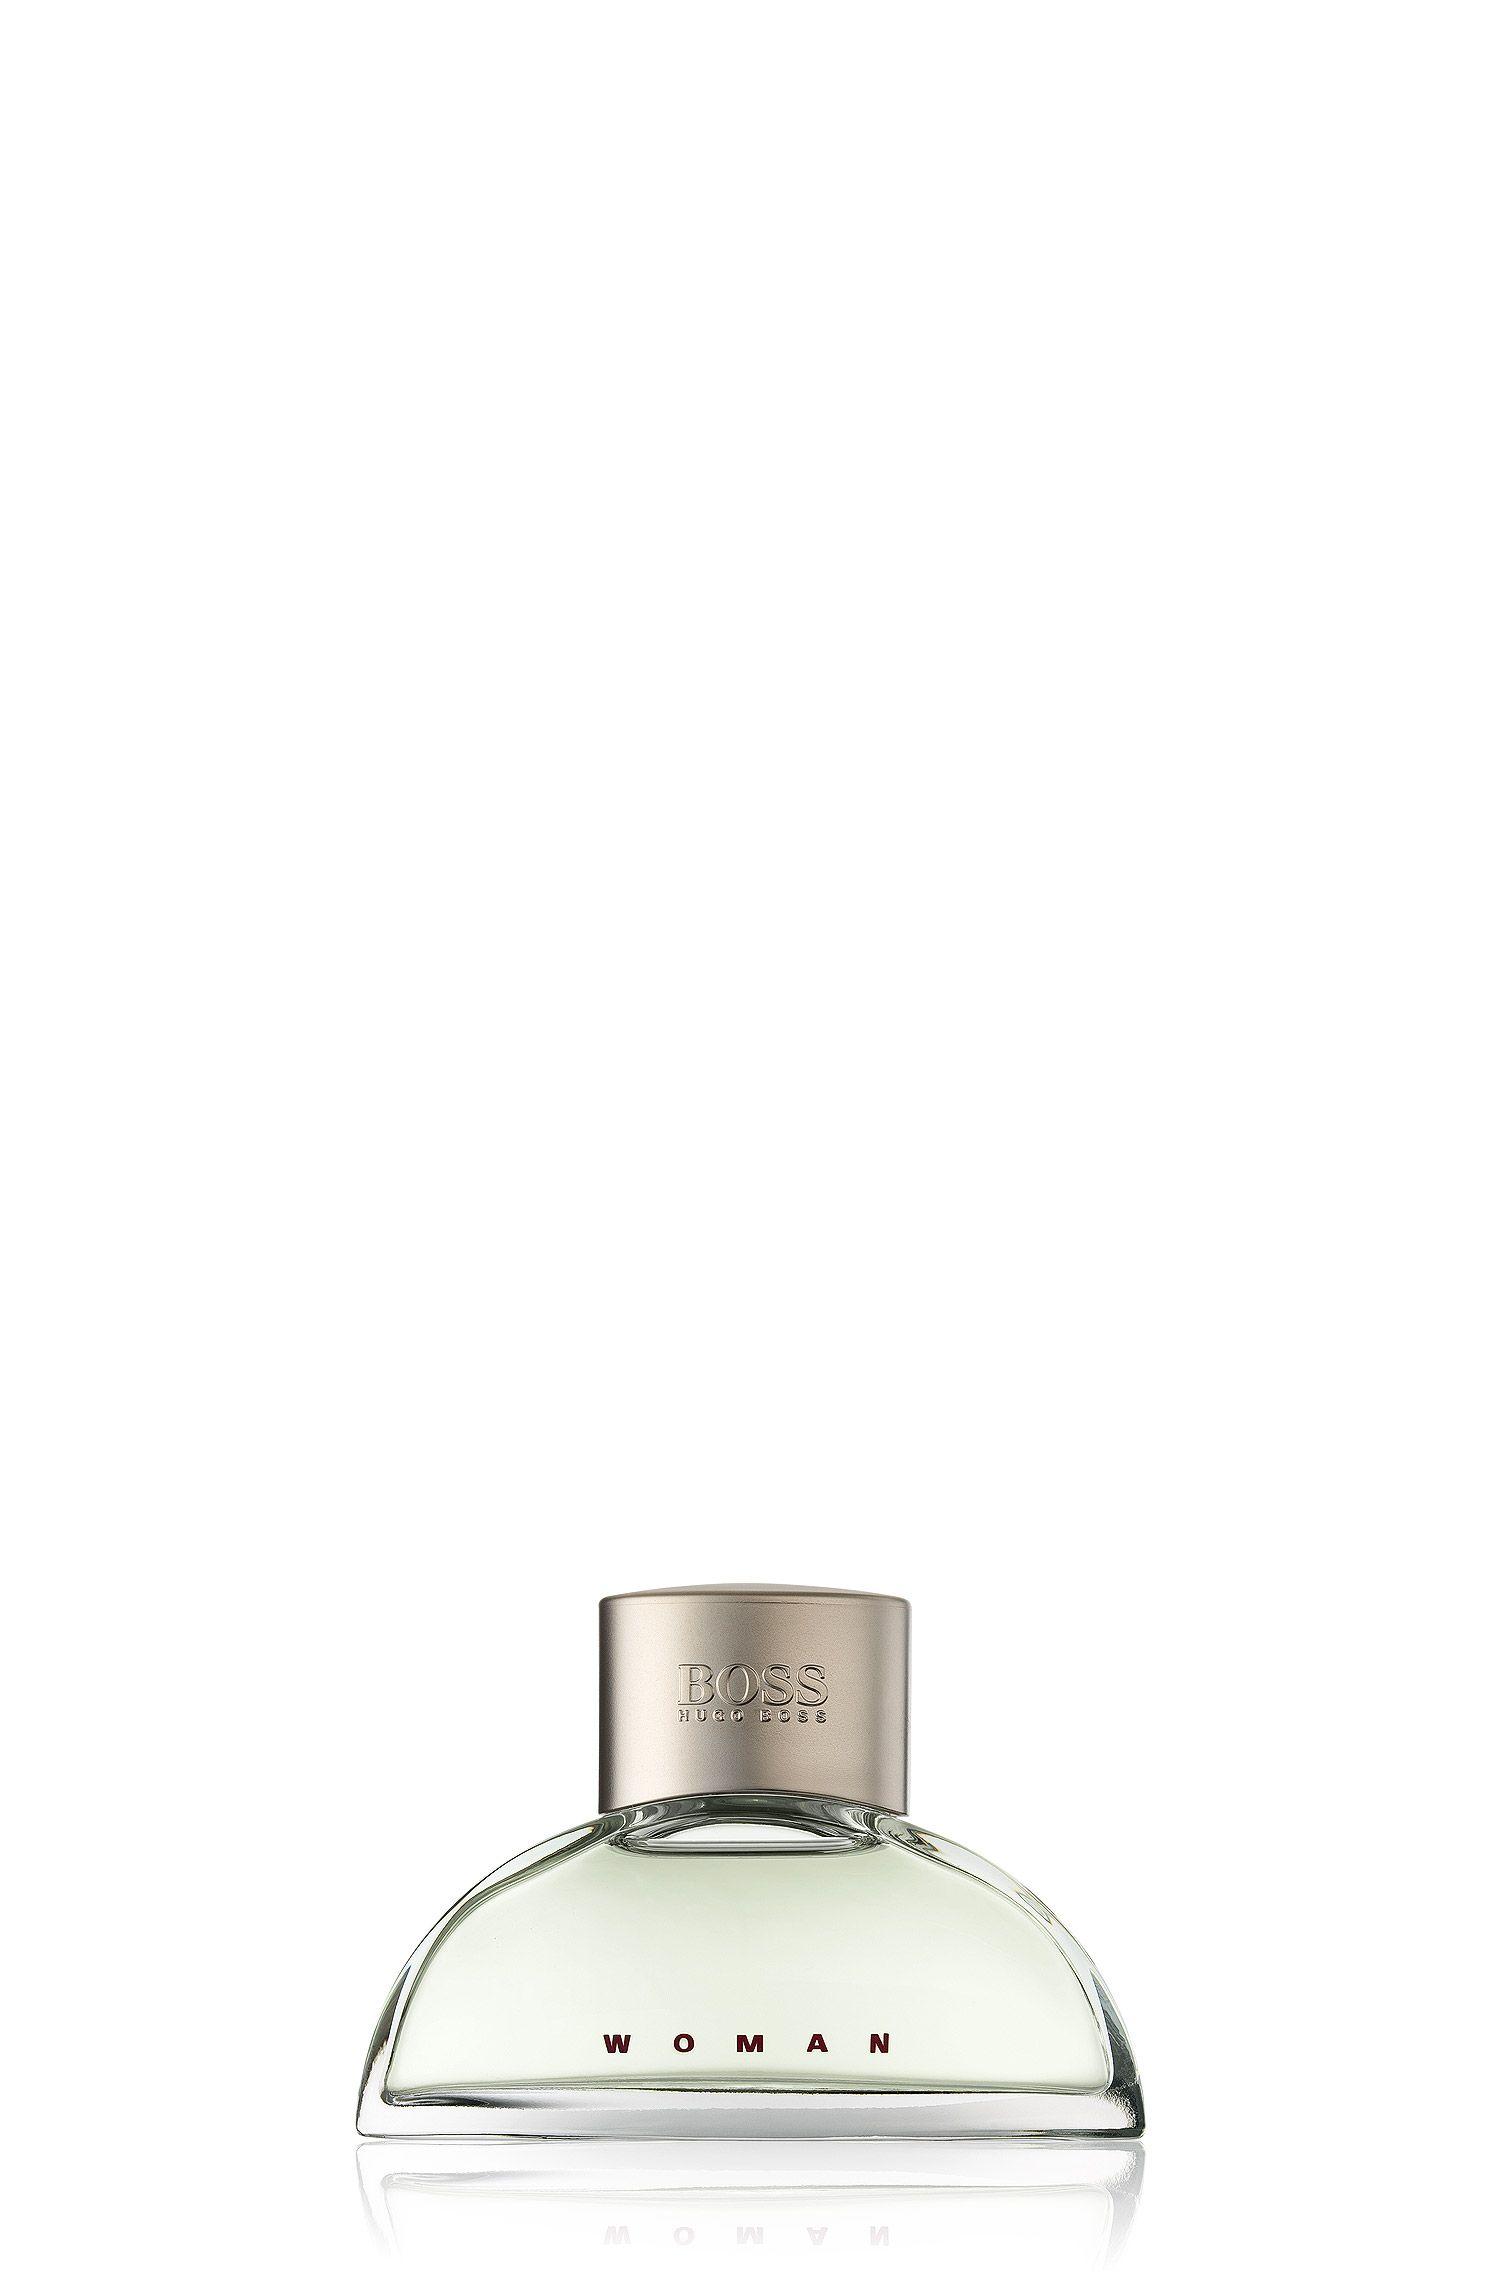 Eau de parfum BOSS Woman 50ml